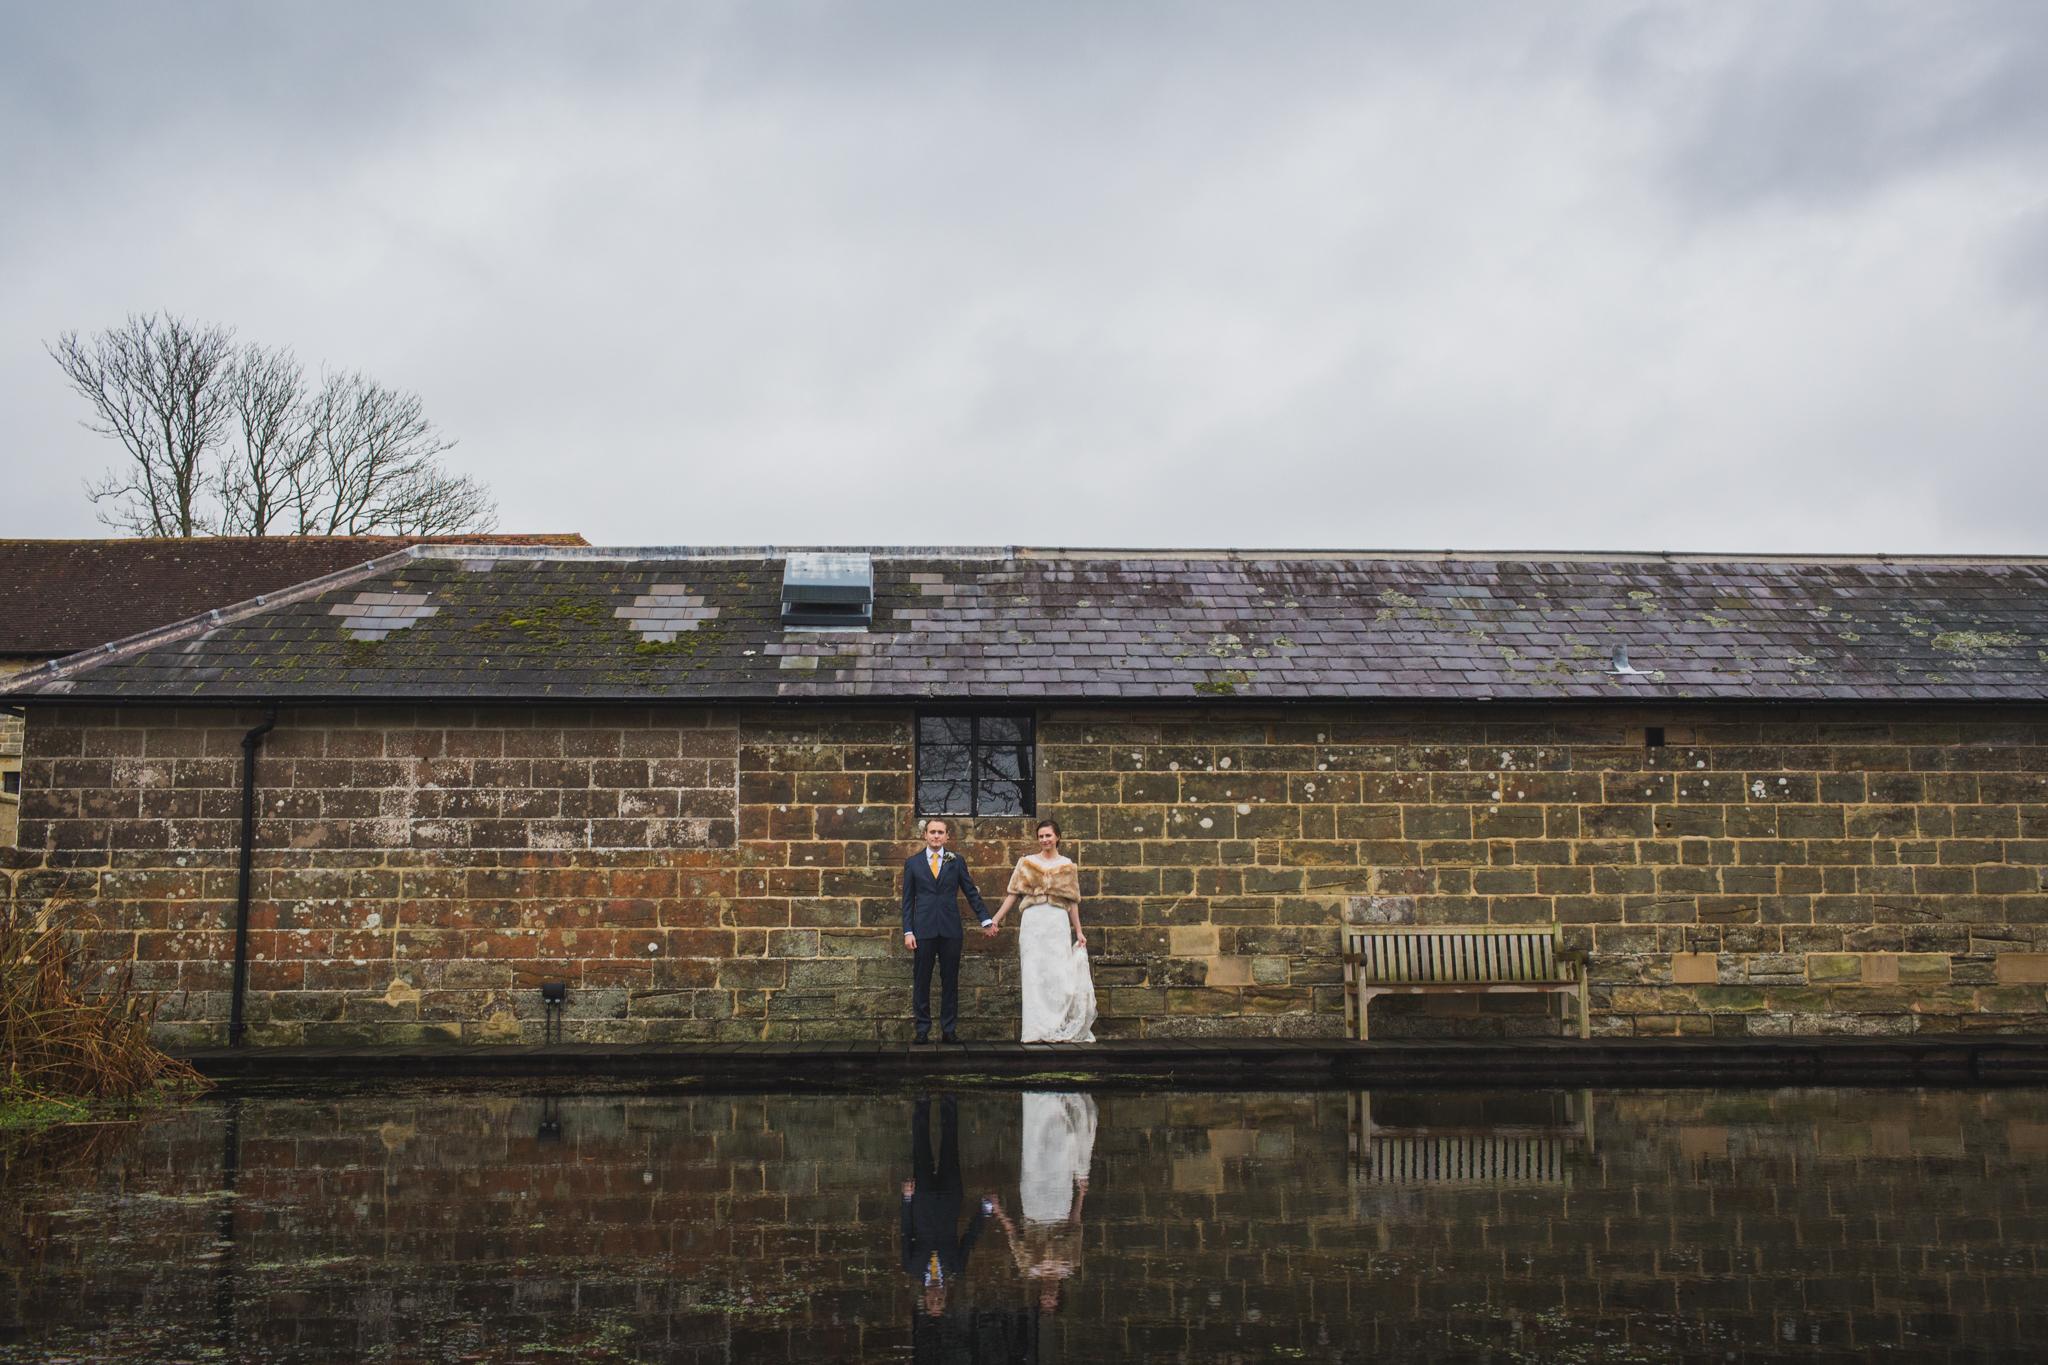 hendall manor barn, sussex barn wedding review